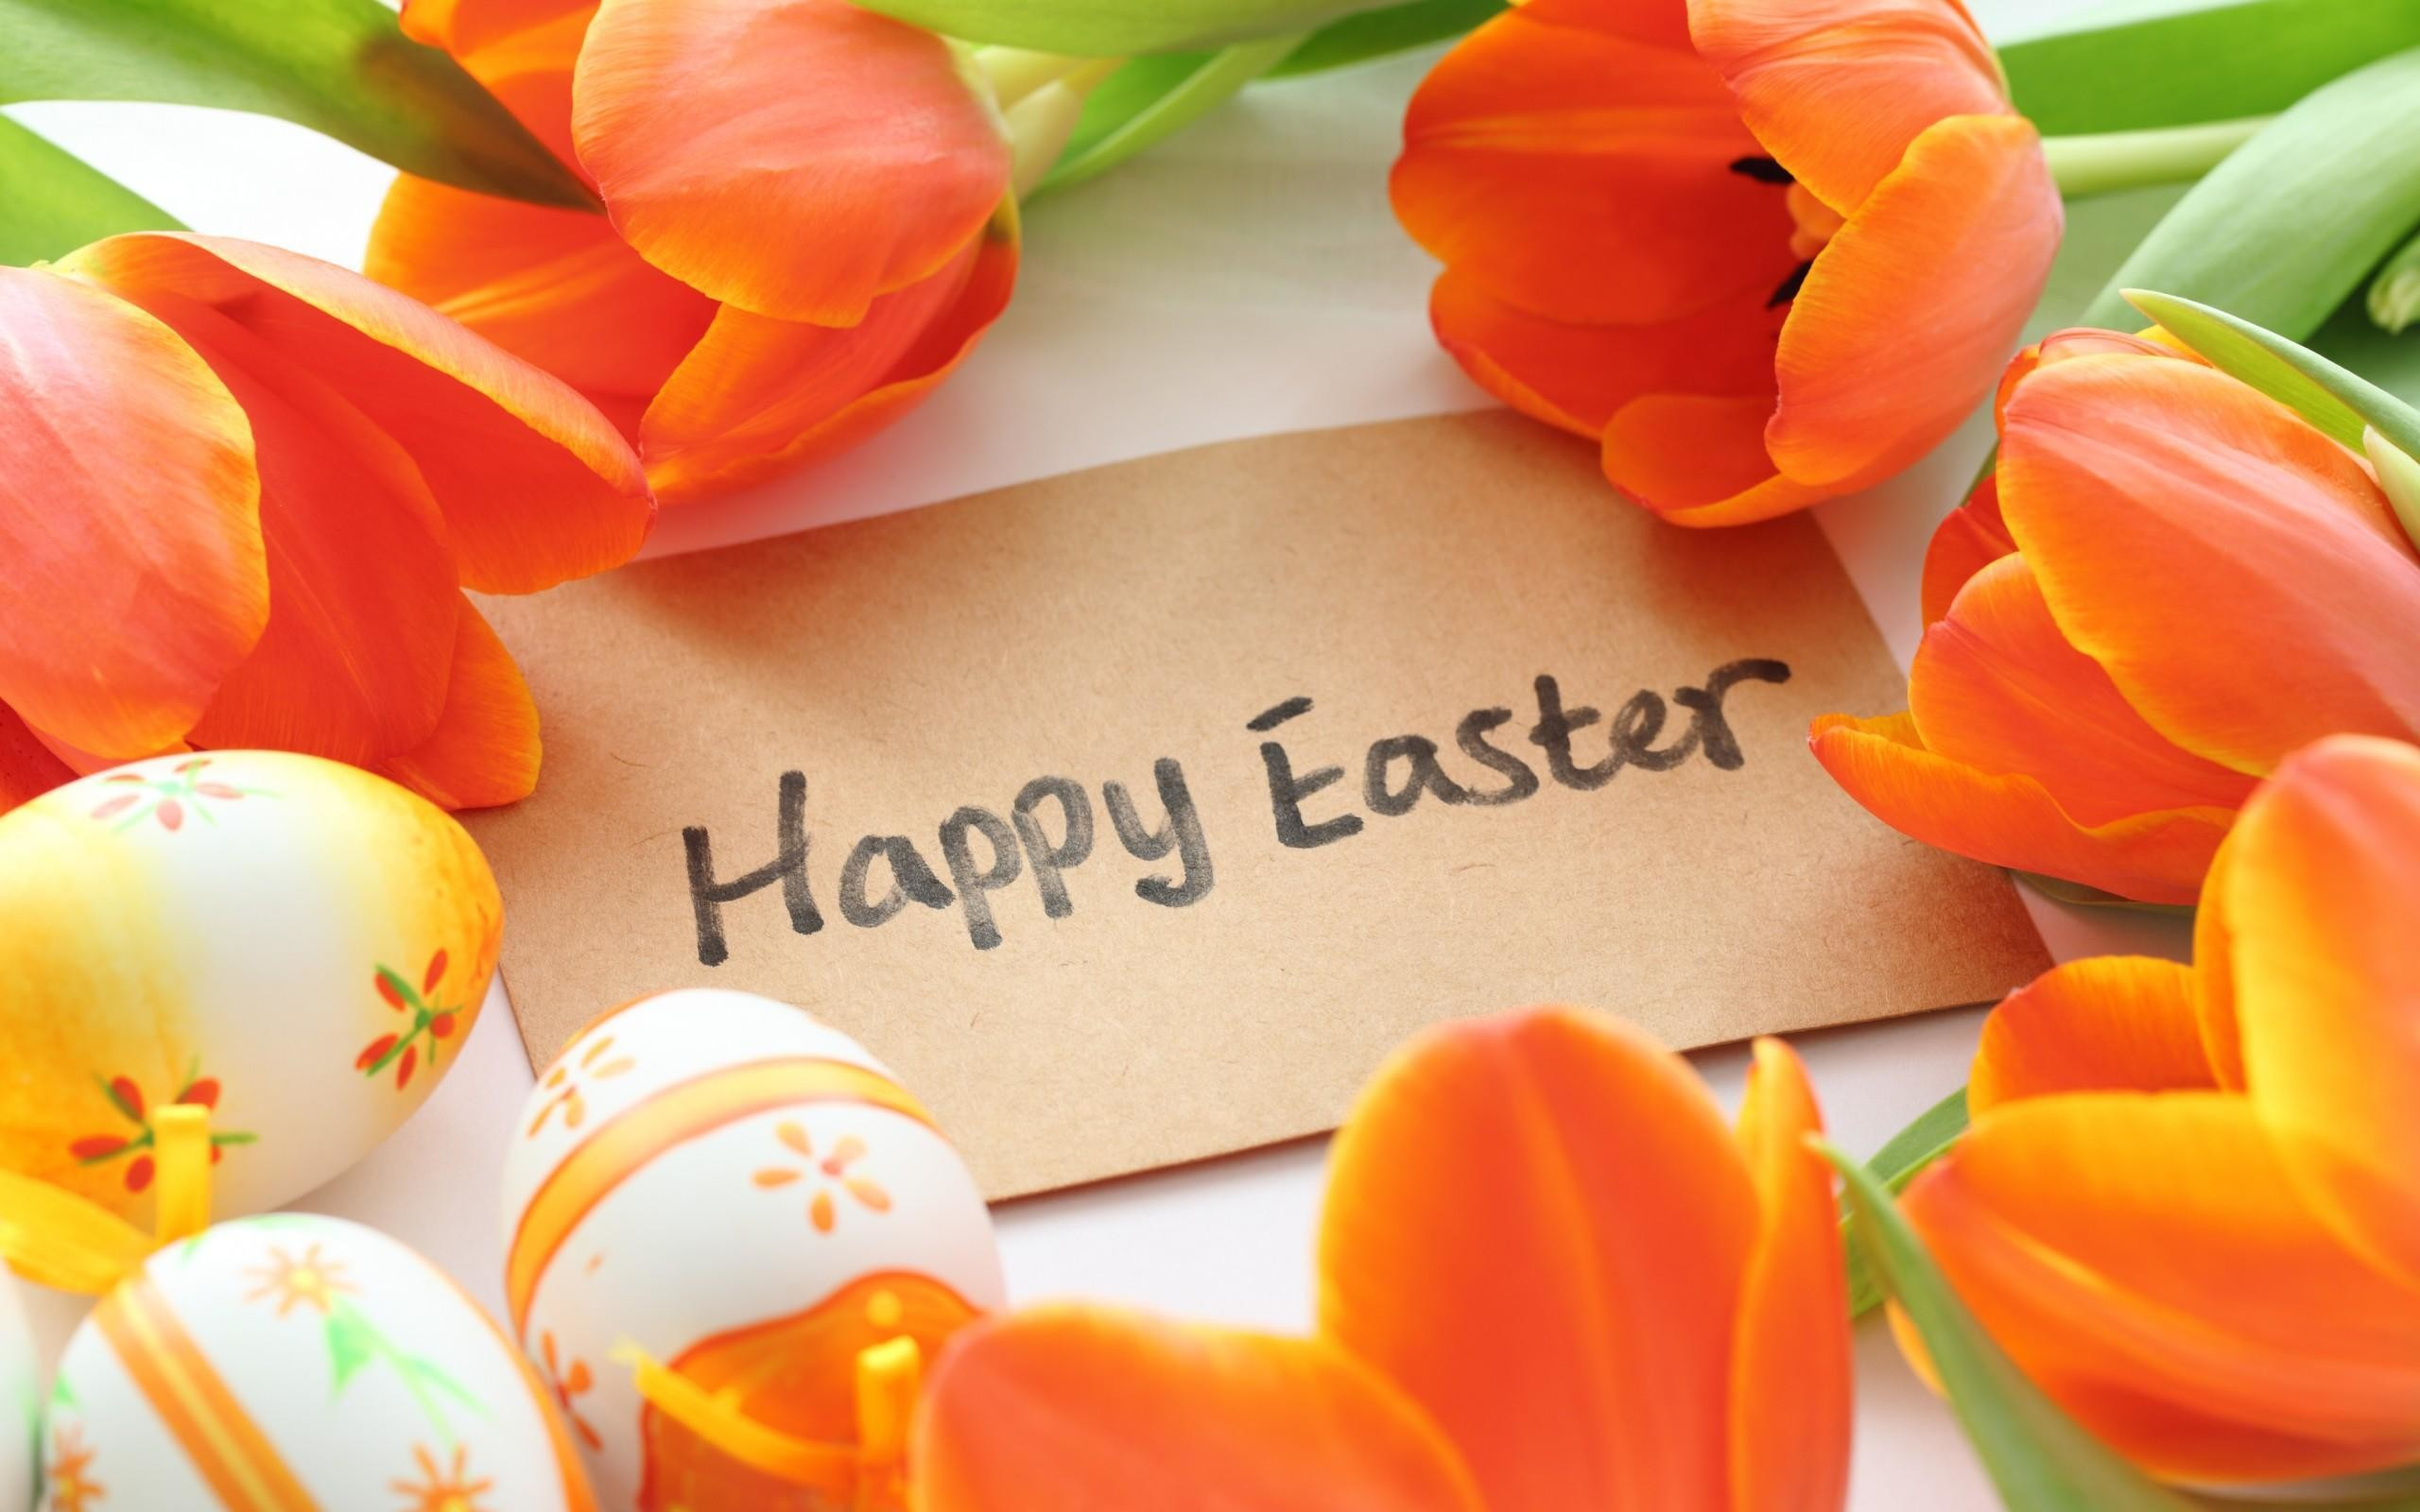 Happy Easter Desktop Wallpaper 2560×1600 | Cool PC Wallpapers